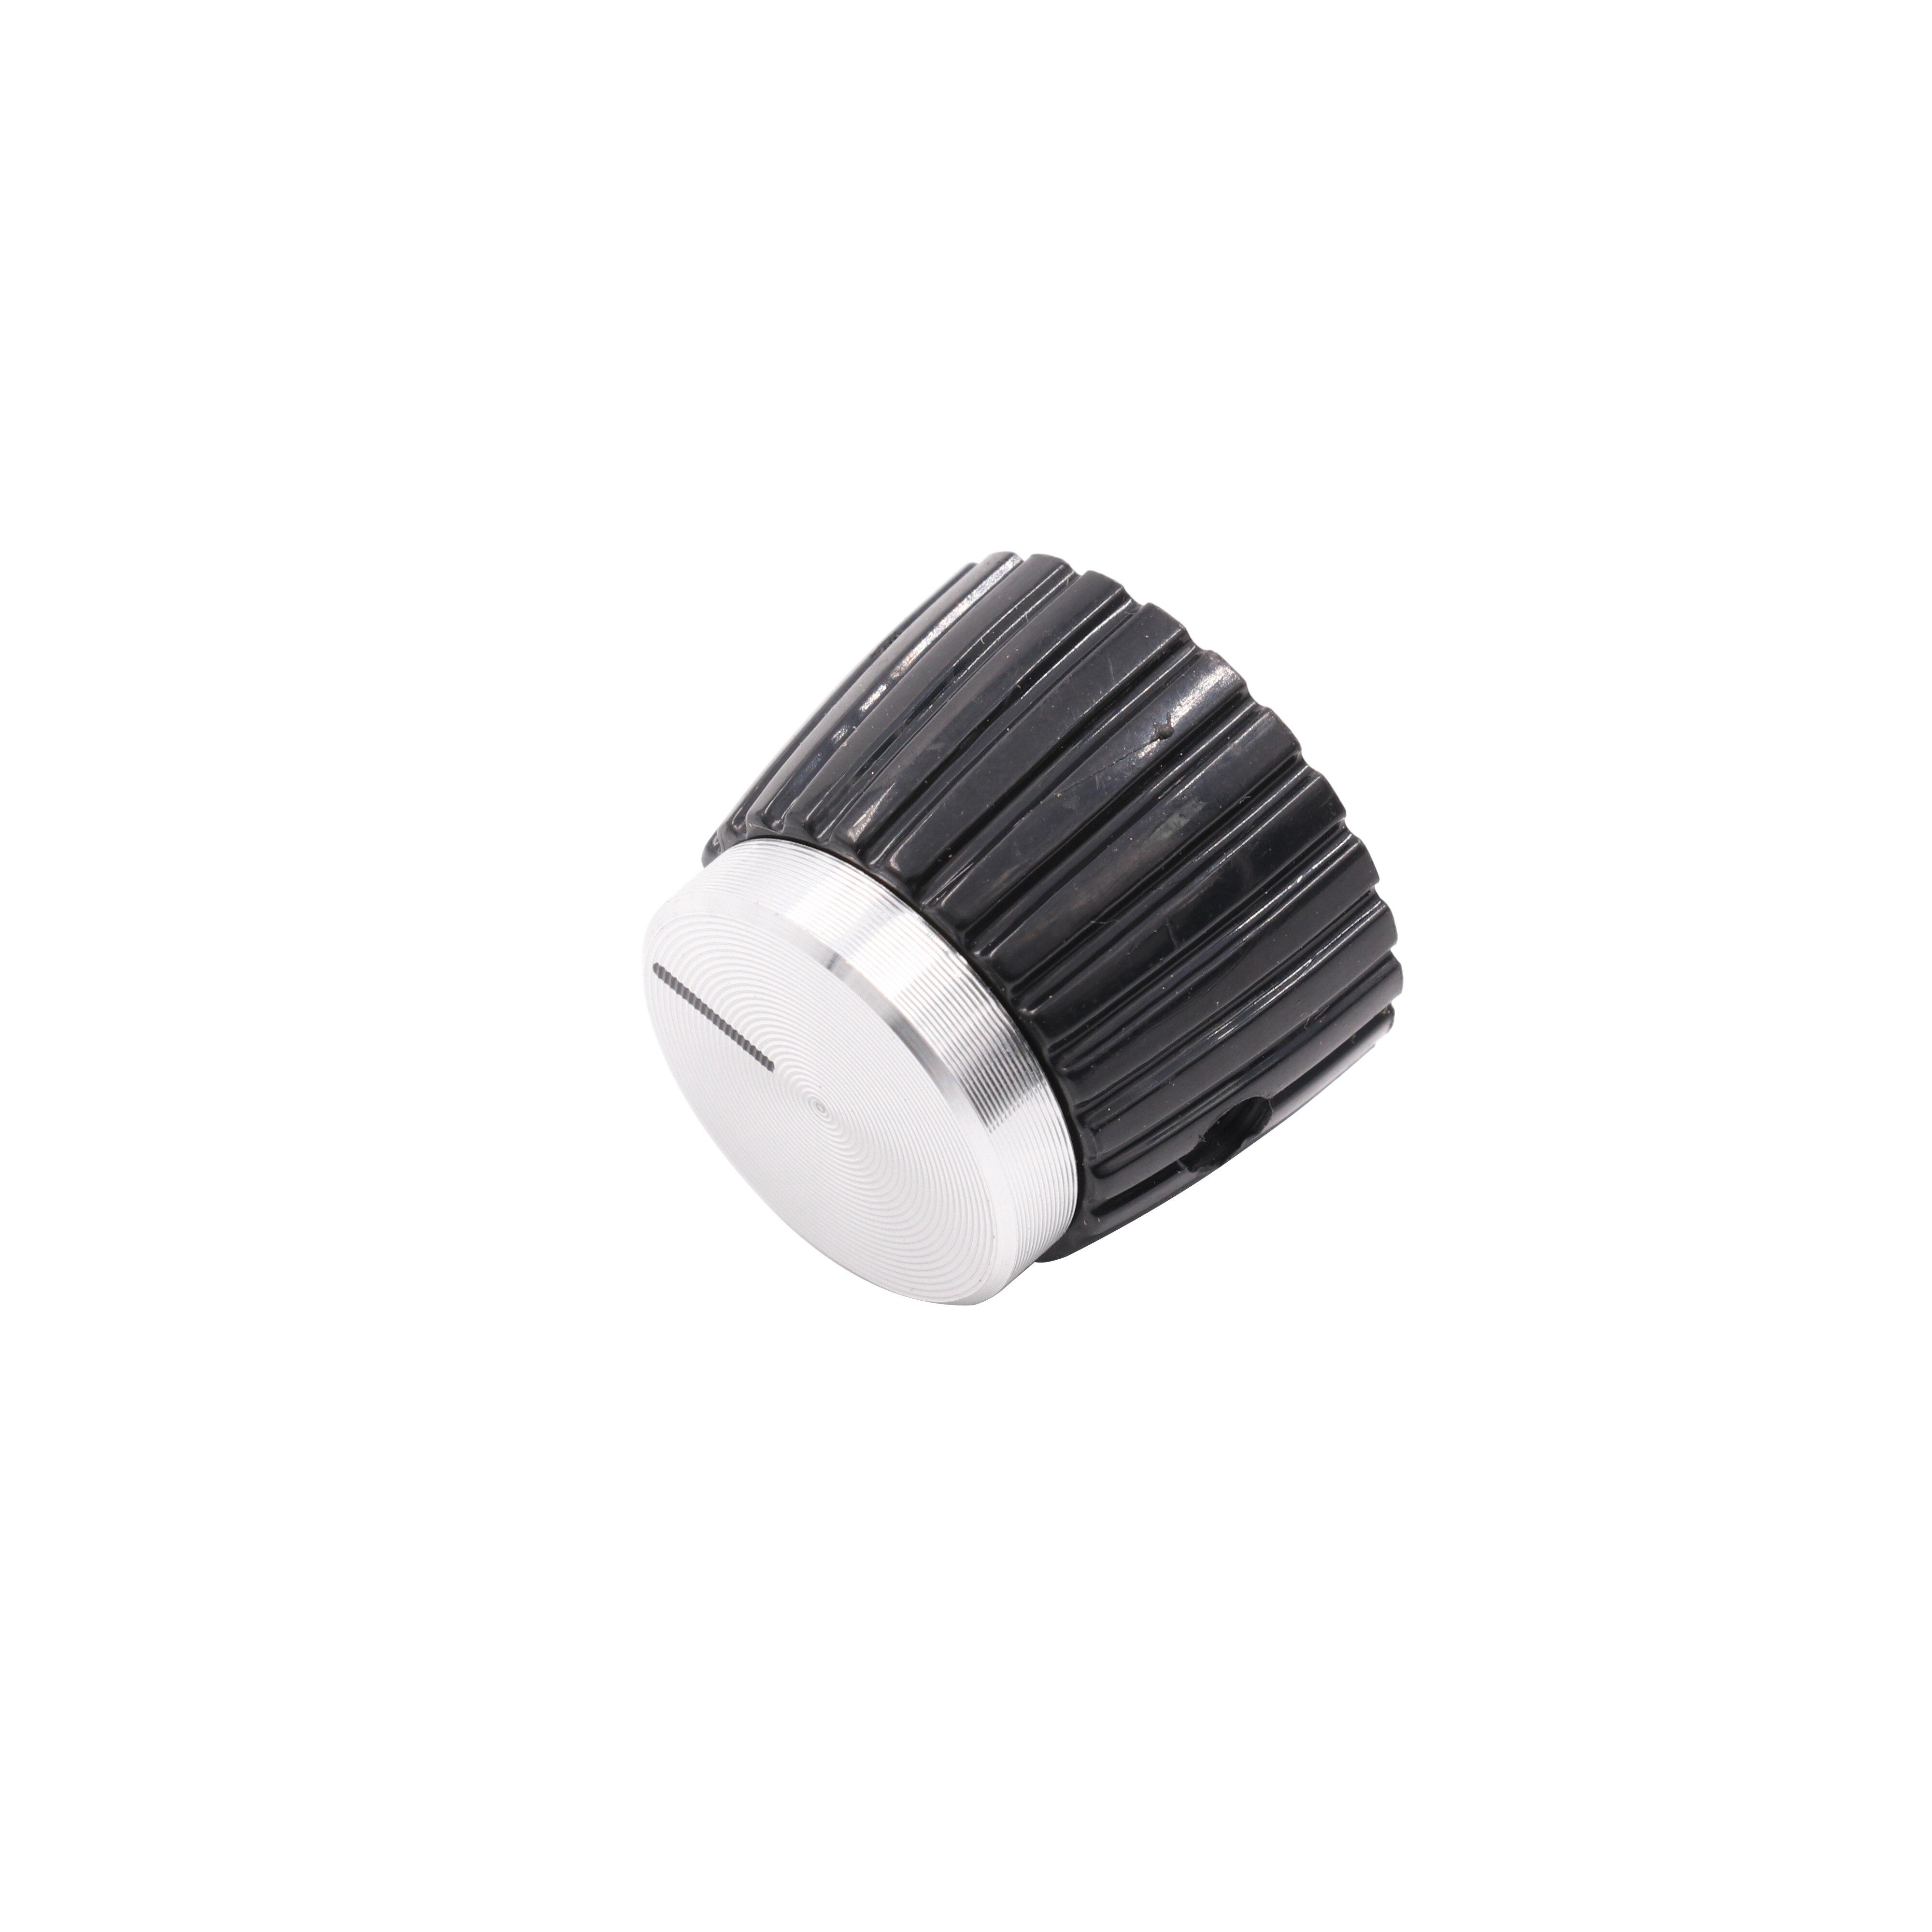 20pcs Red Indication 6mm Shaft Hole Knurled Grip Potentiometer Pot Knobs Caps PB